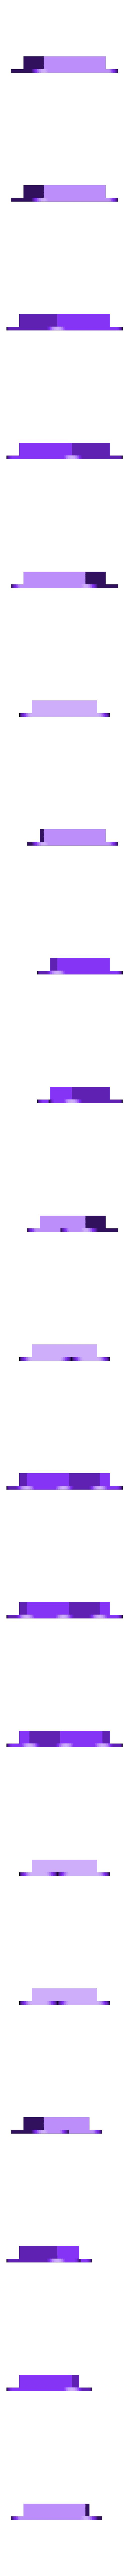 PIE 45x45x3.STL Download STL file Shelf Legs • 3D print design, ELBONAERENSE